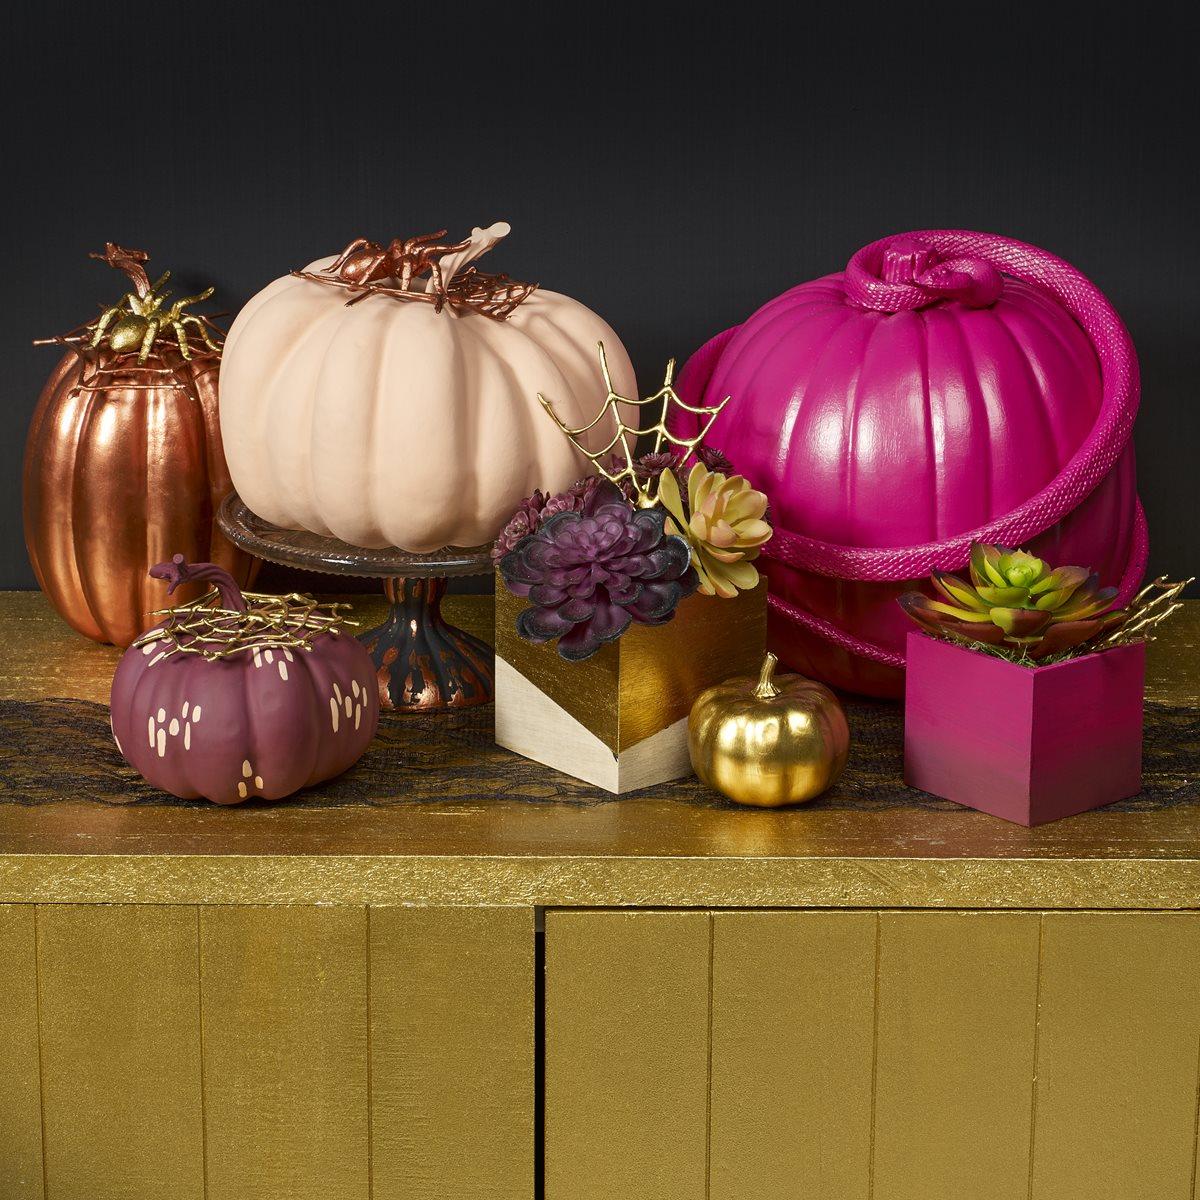 Jewel-Toned Pumpkins & Creatures